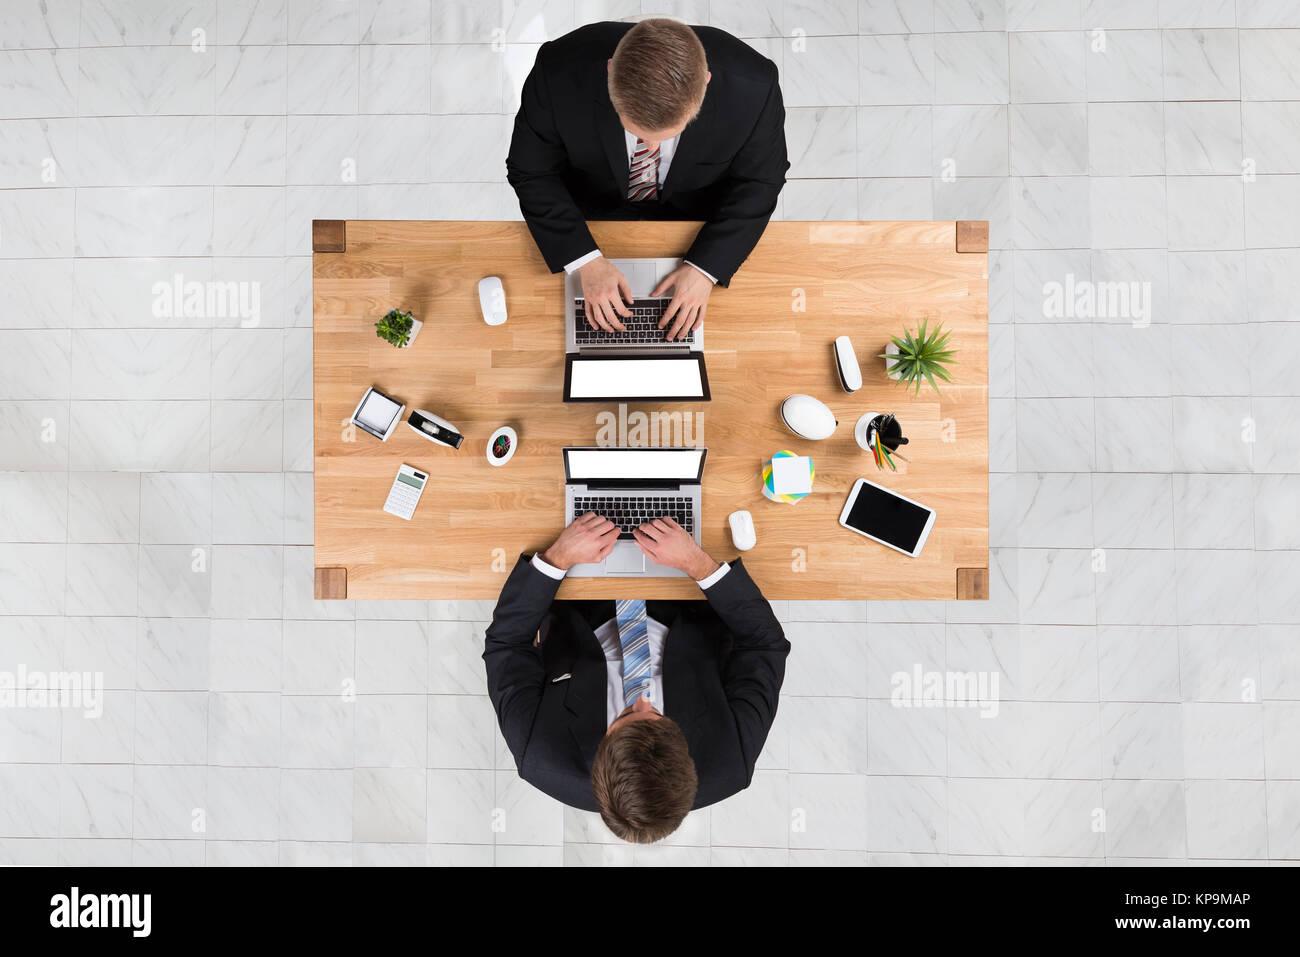 Businessmen Using Laptops At Desk In Office Stock Photo